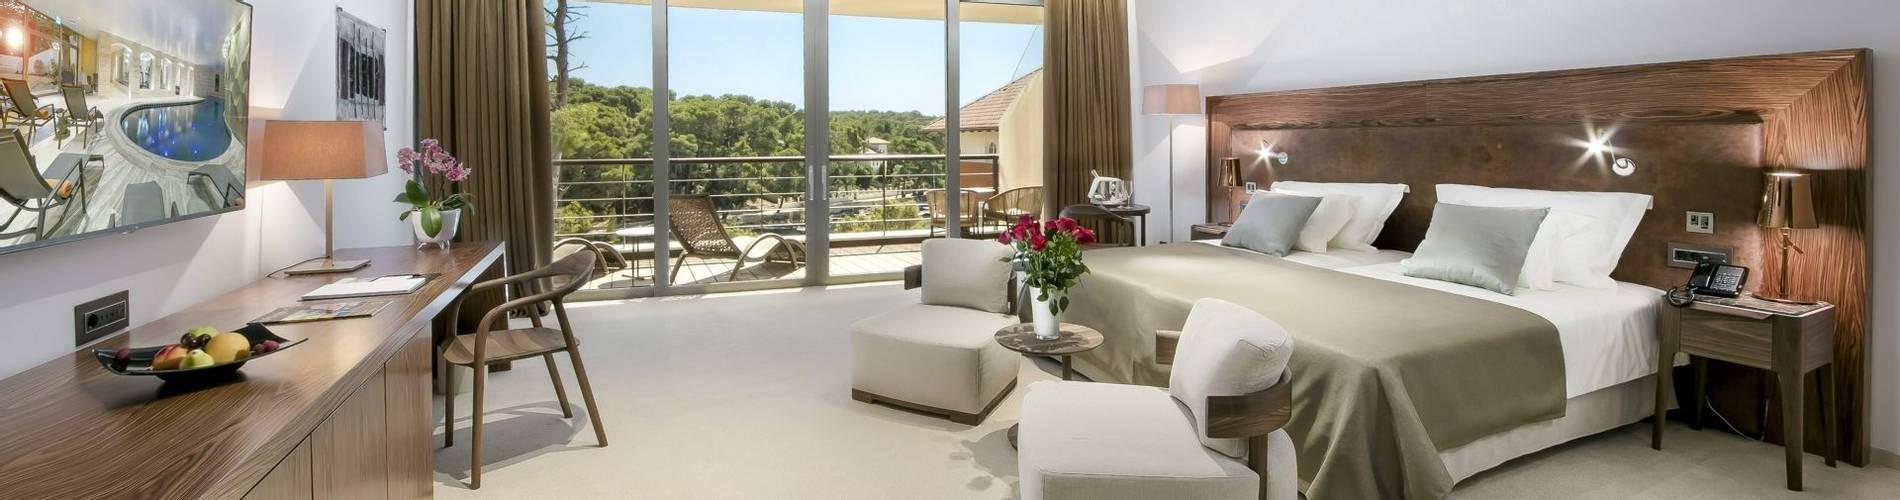 19. Boutique Hotel Alhambra_ anex_room (1).jpg